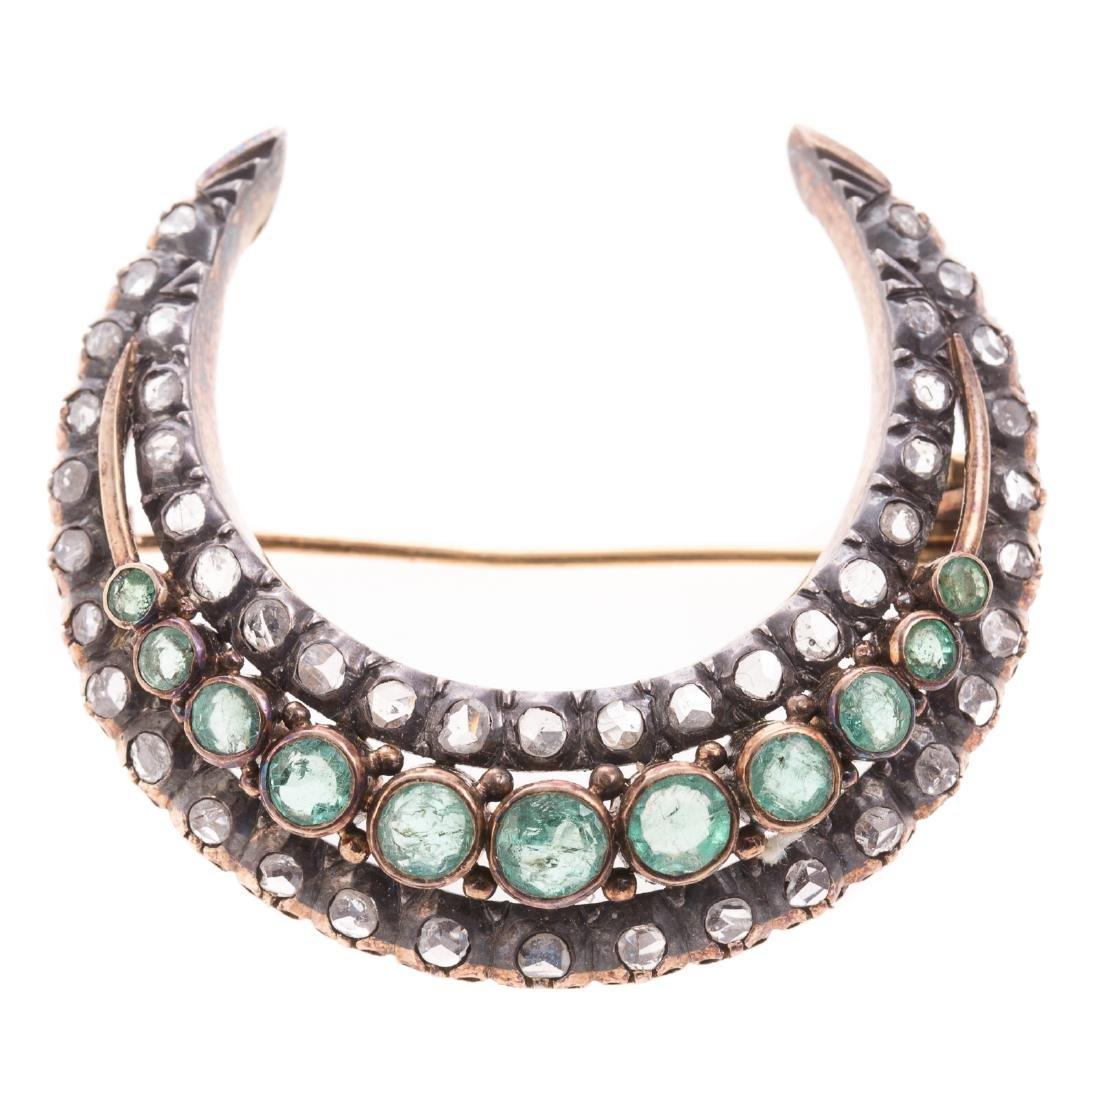 An Edwardian Emerald & Diamond Crescent Moon Pin